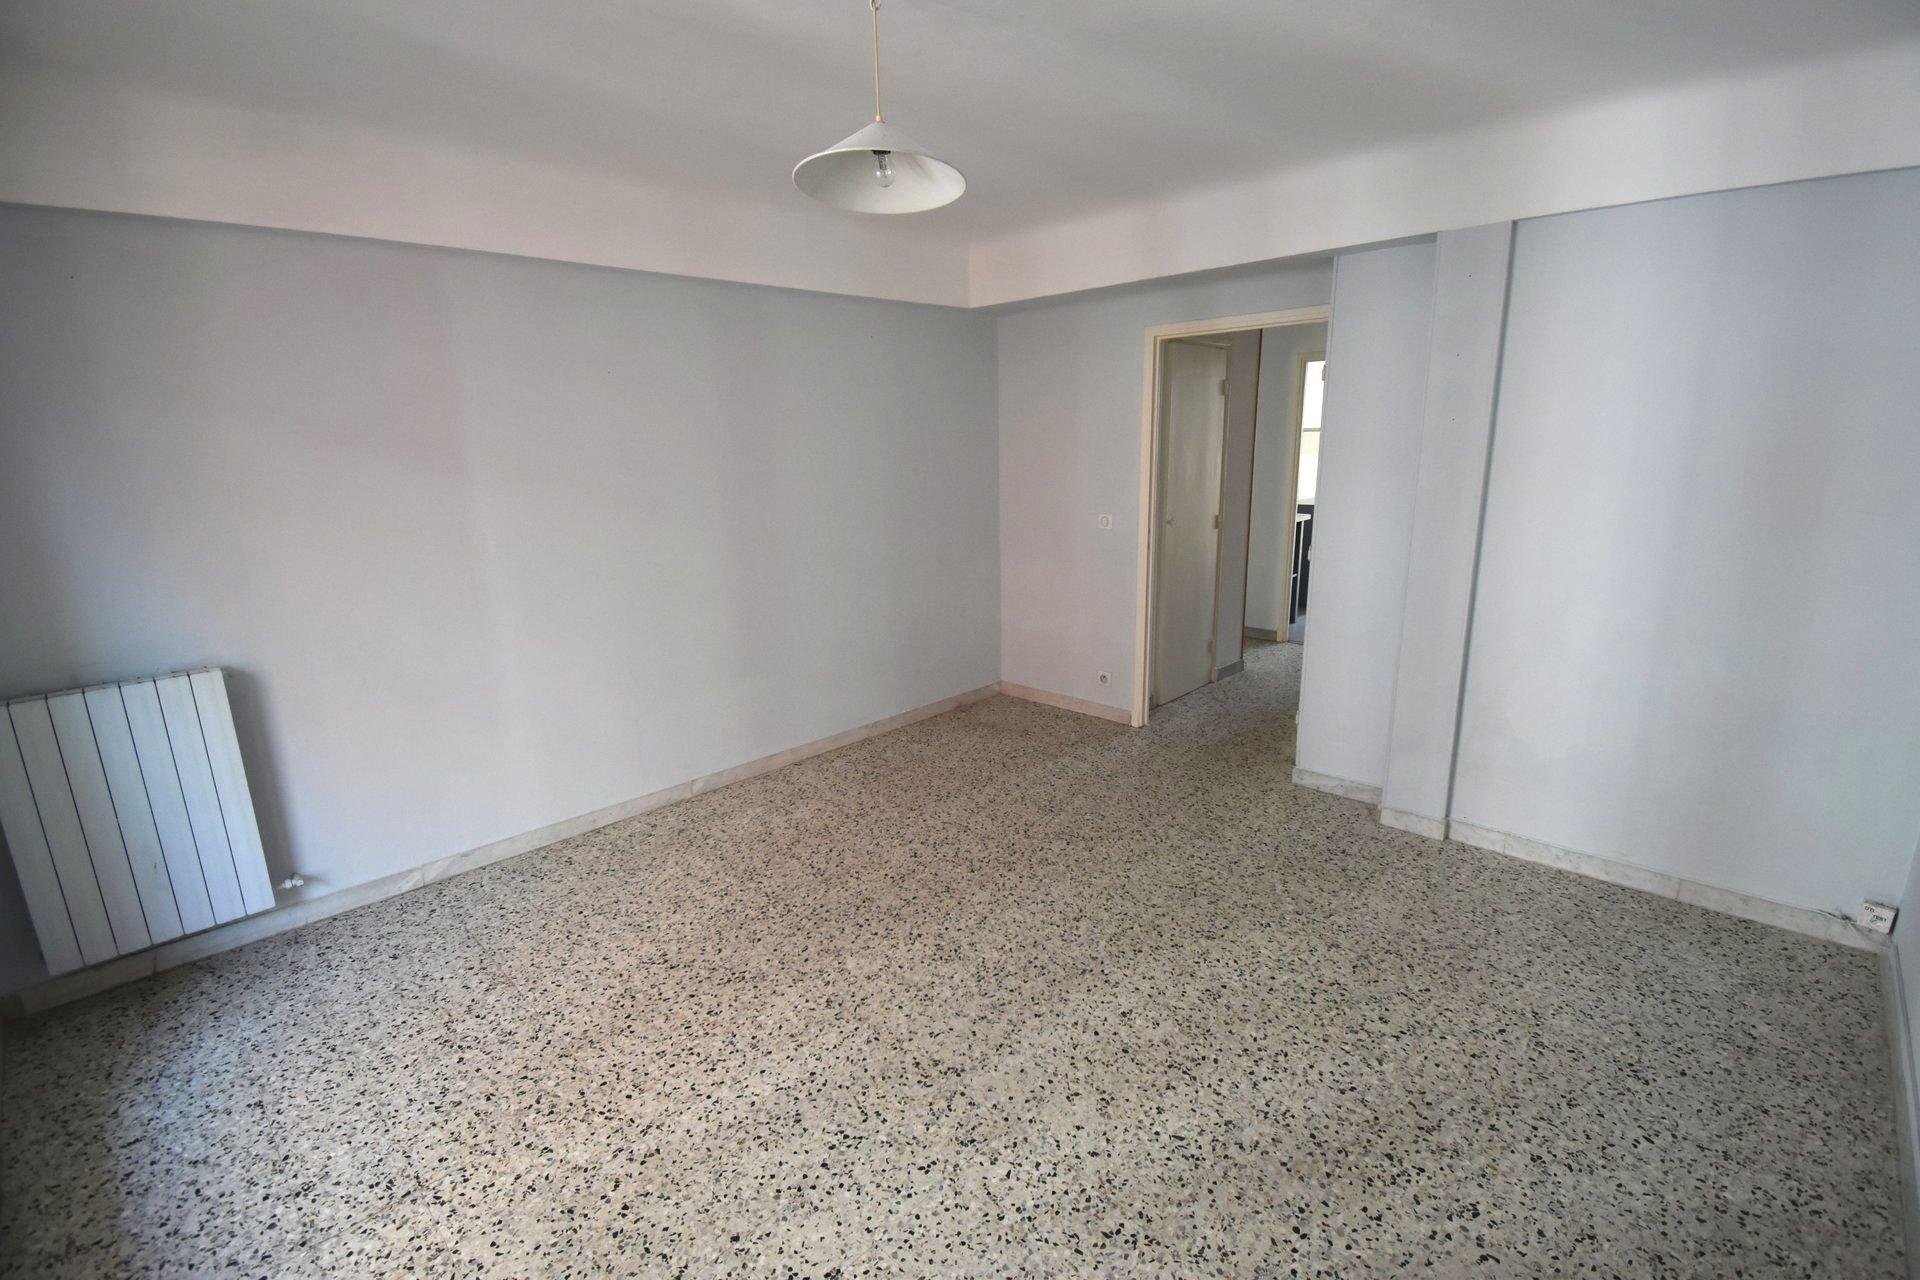 Vente Nice Ariane Appartement 3 pièces 82 000 €